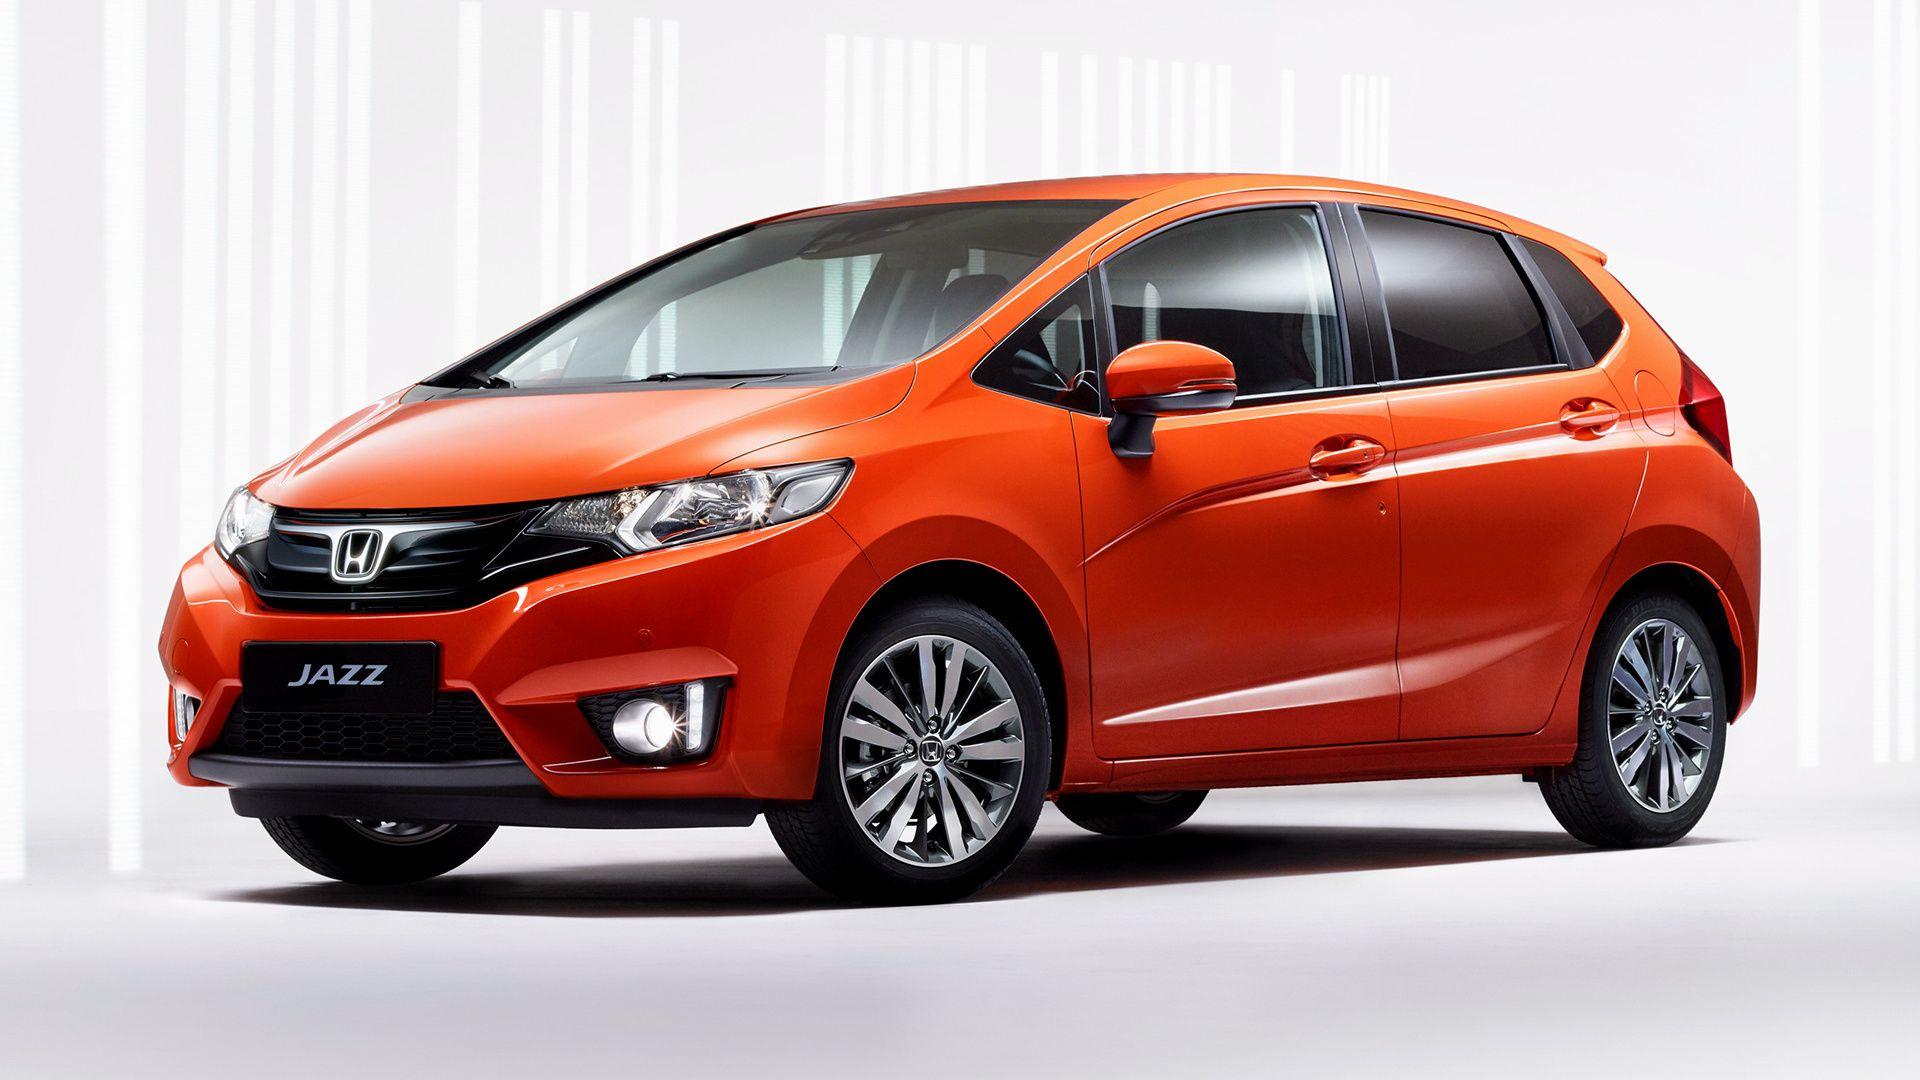 Honda jazz 2015 wallpapers and hd images car pixel